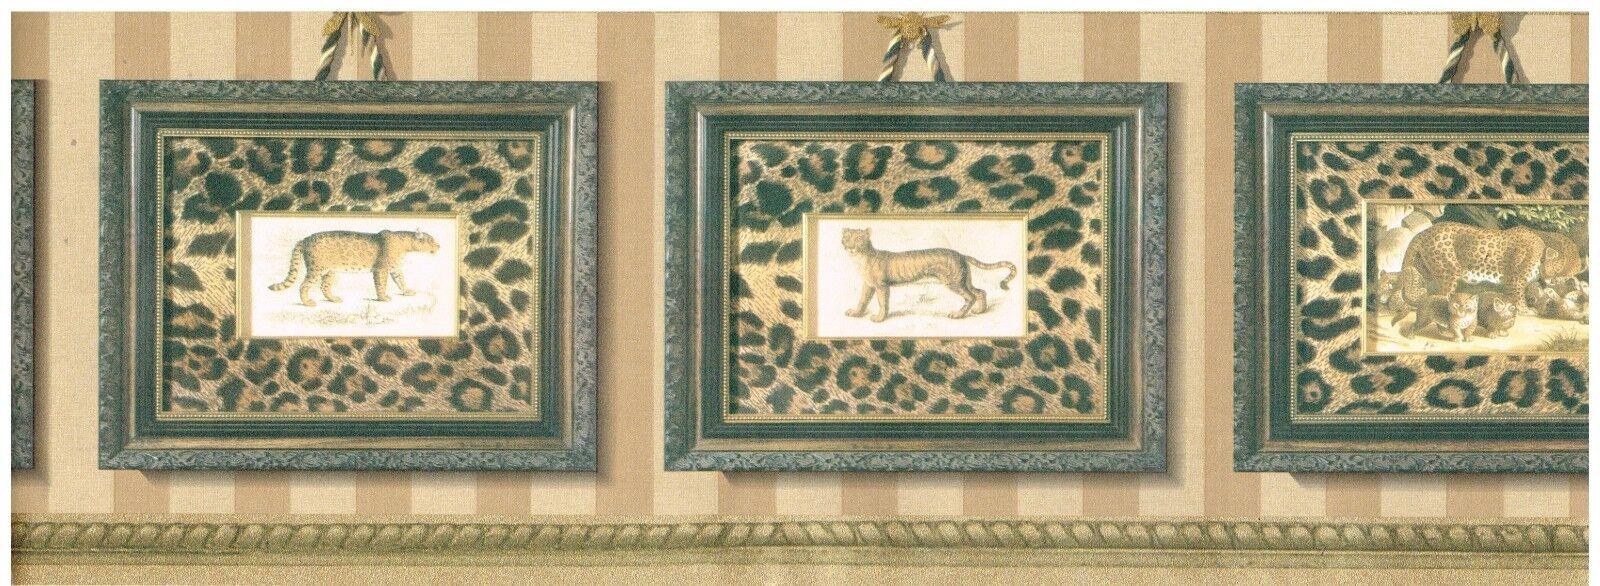 JUNGLE CATS IN LEOPARD FRAMES  WALLPAPER   BORDER   5803910